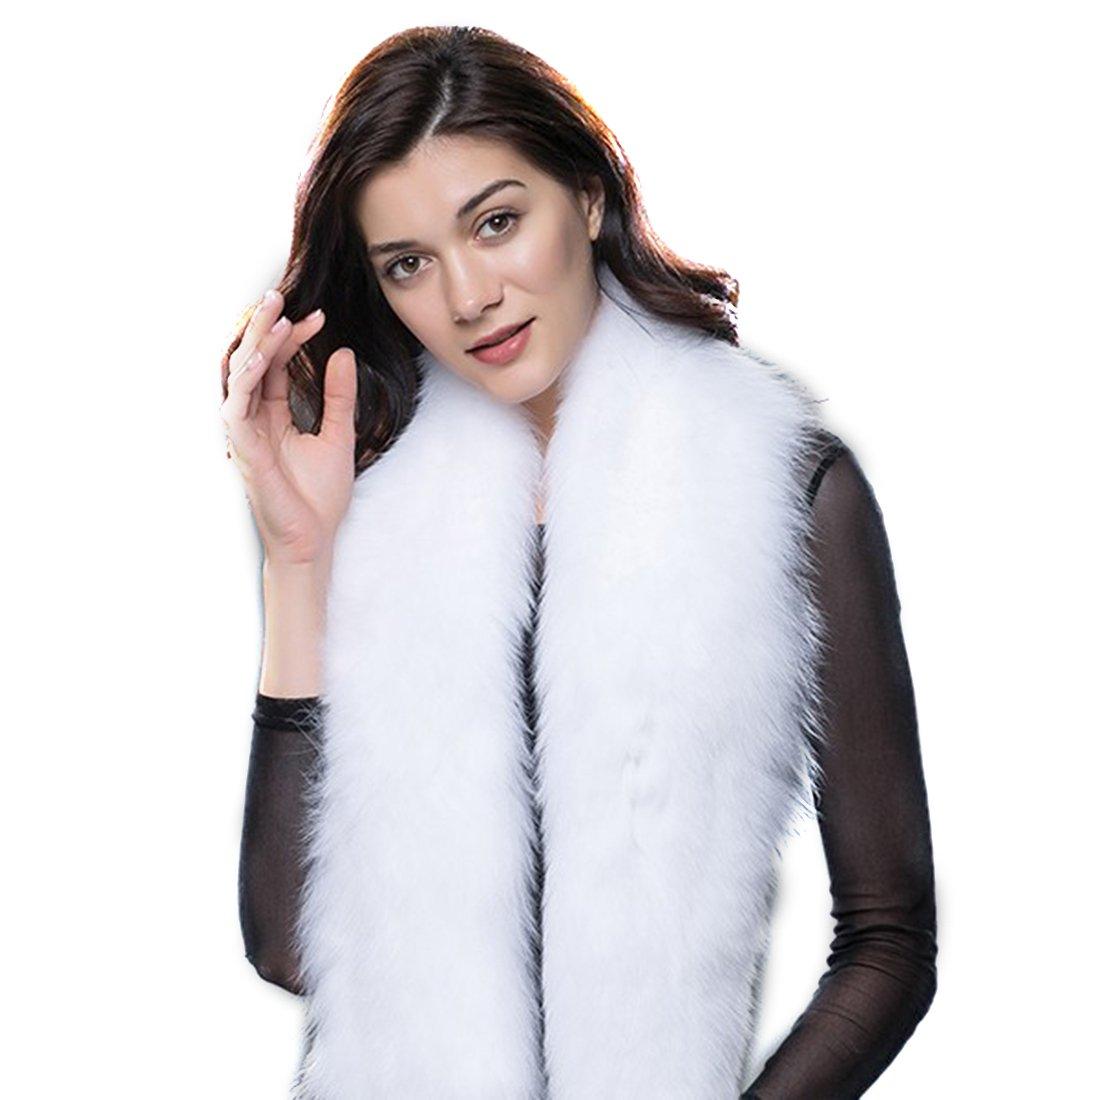 URSFUR 毛皮 大判 フォックスファー ショール ファッション マフラー キツネファー B01MTL4GDA Fサイズ ホワイト ホワイト Fサイズ